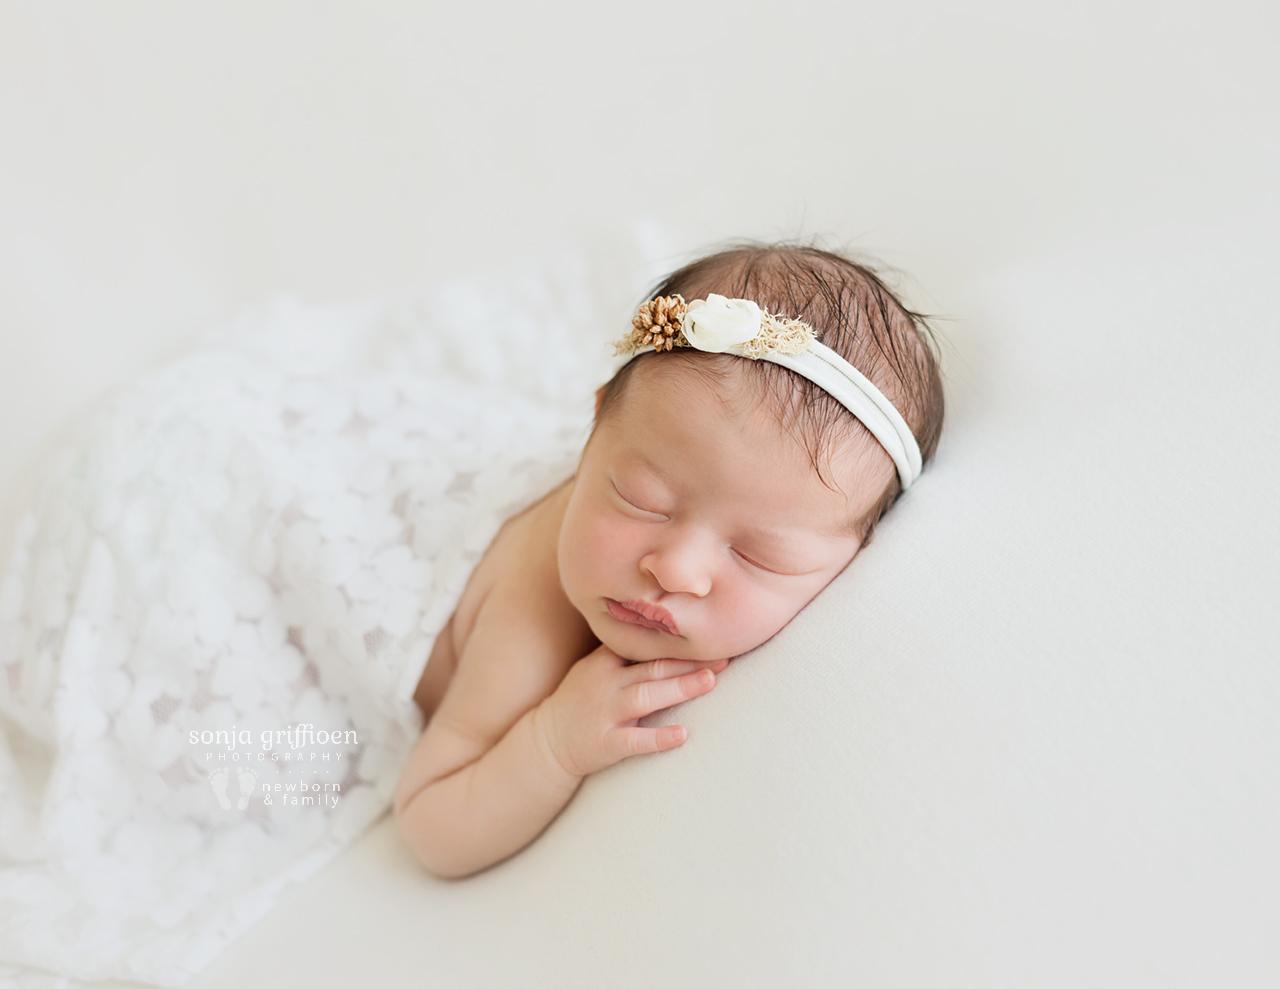 Hazel-Newborn-Brisbane-Newborn-Photographer-Sonja-Griffioen-15.jpg